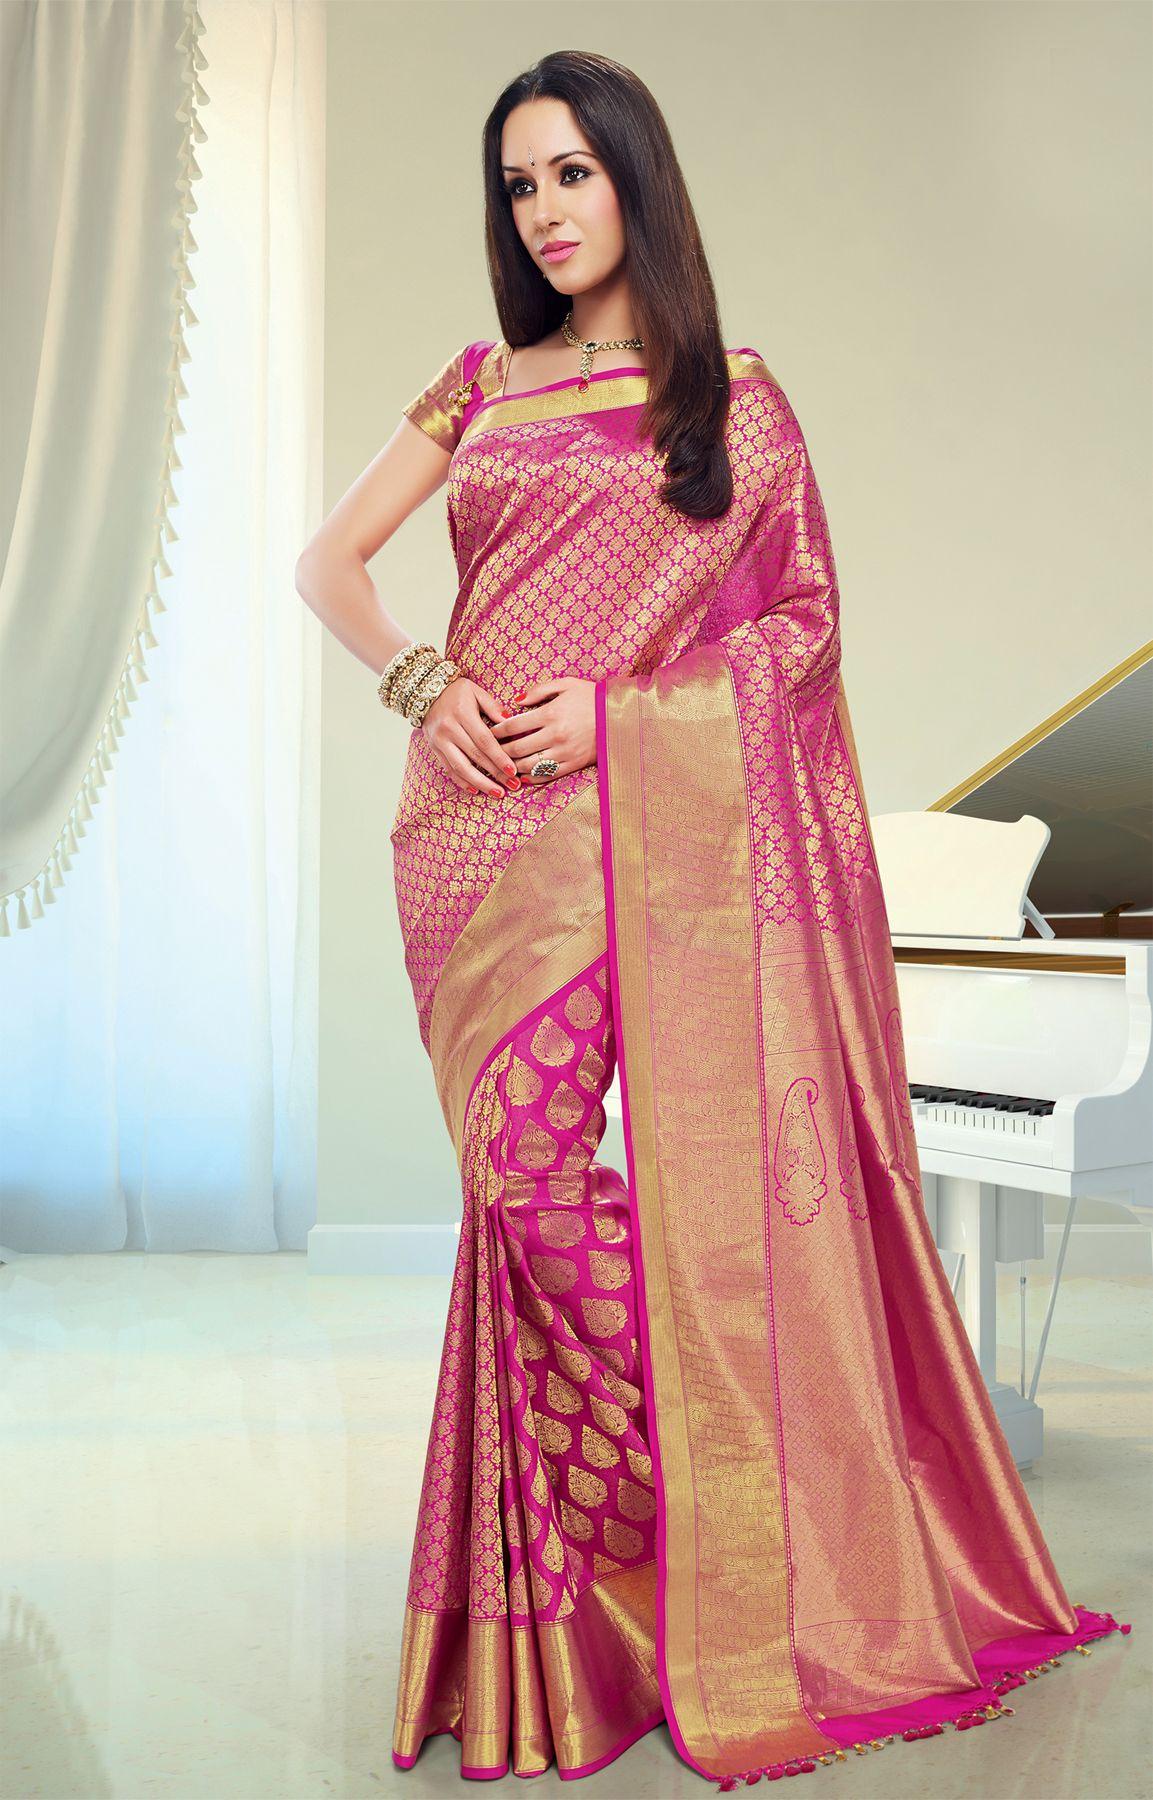 e2320486b5828 Wedding Collections1847 - RmKV Silks